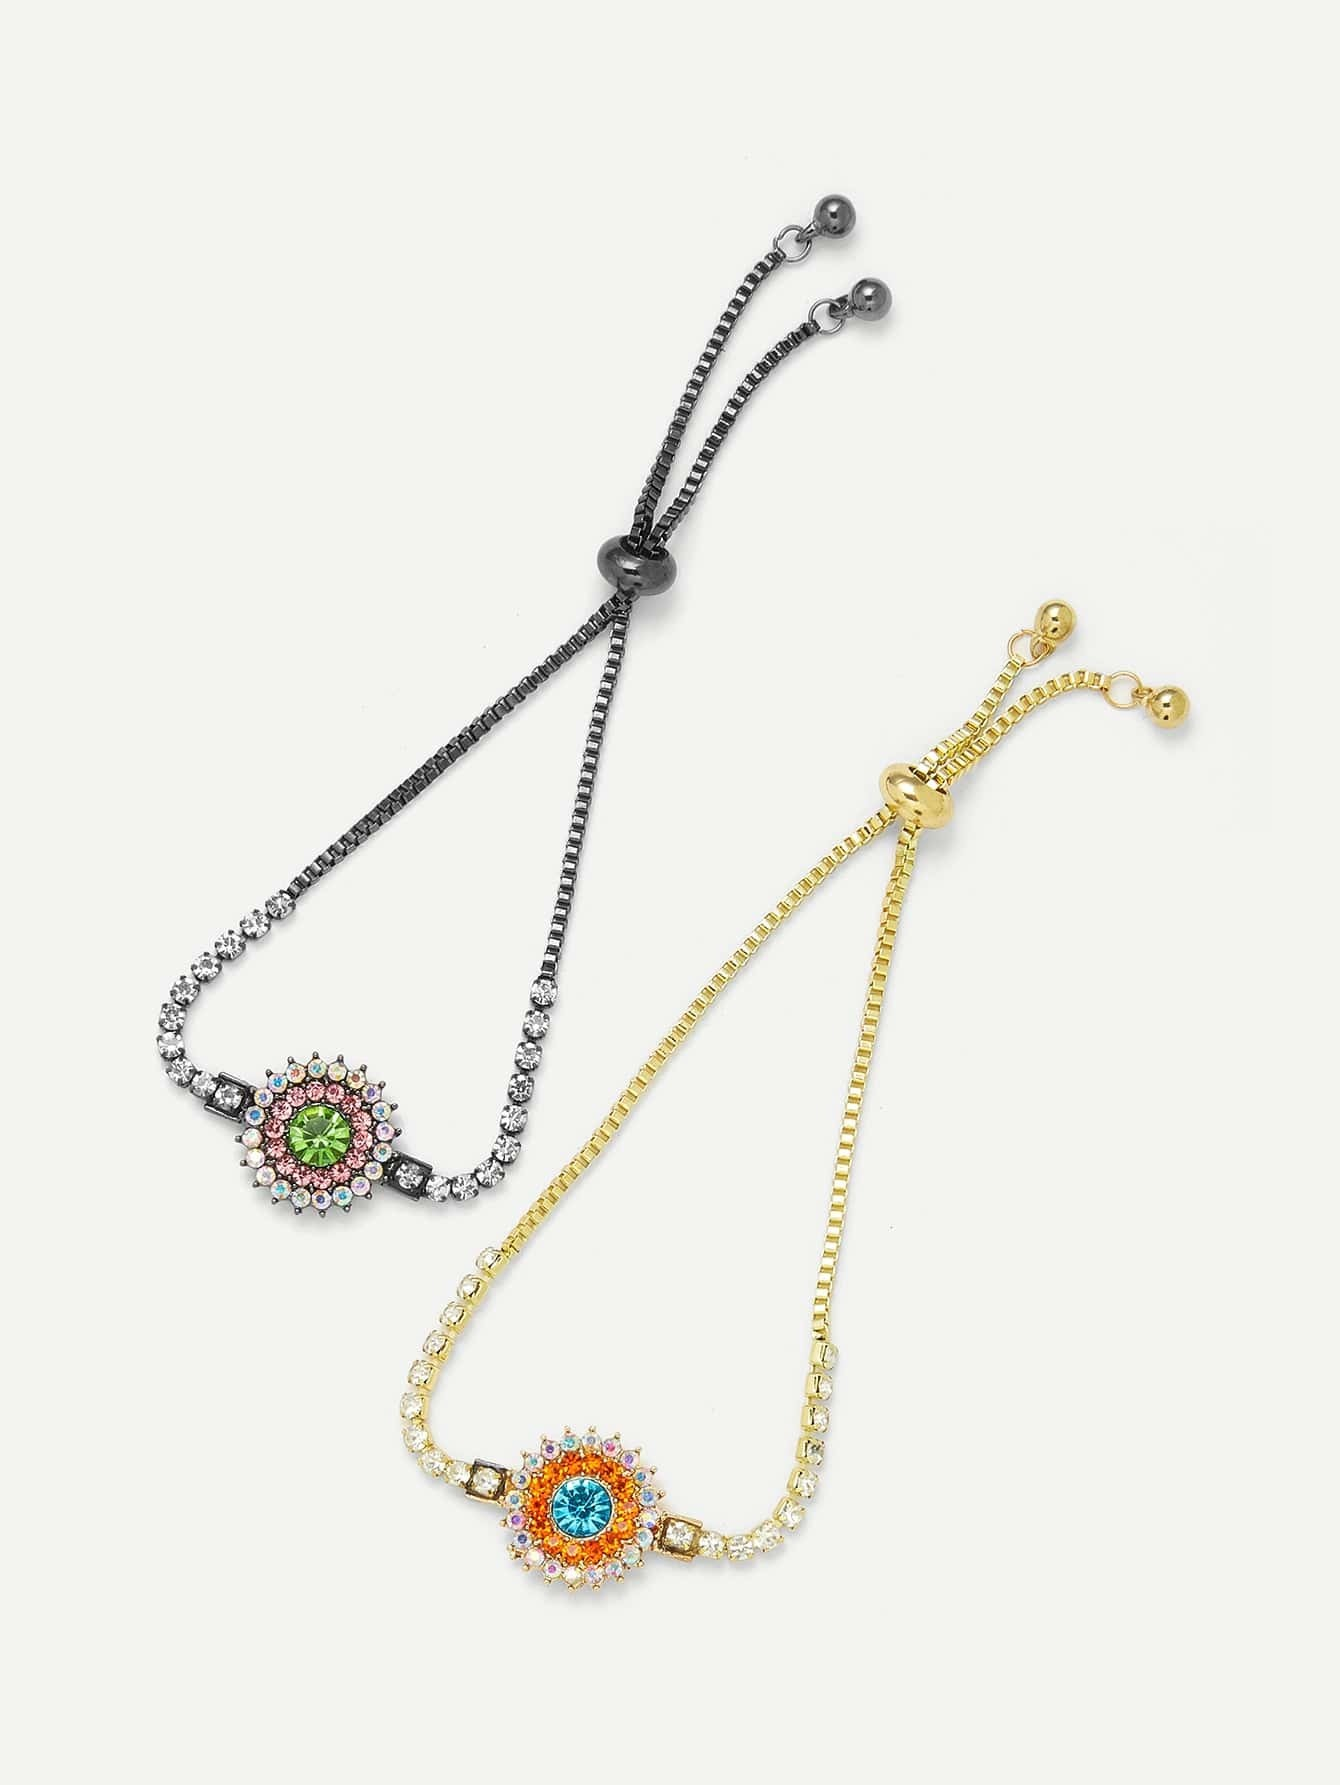 Rhinestone Flower Design Chain Bracelet Set wing design chain bracelet